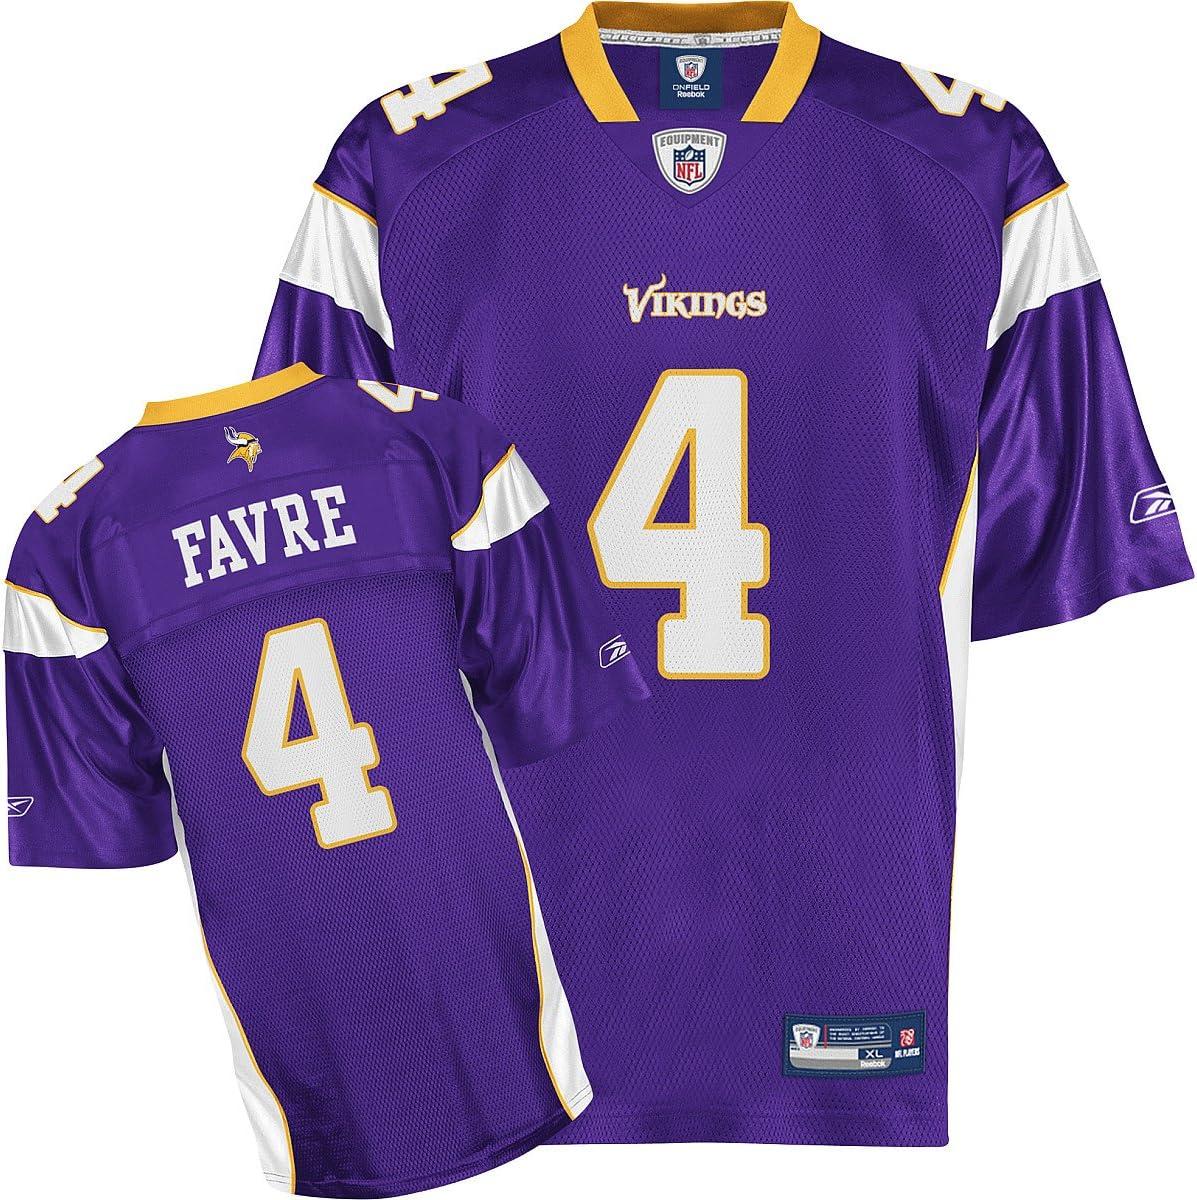 Amazon.com : Reebok Minnesota Vikings Brett Favre Youth Replica ...